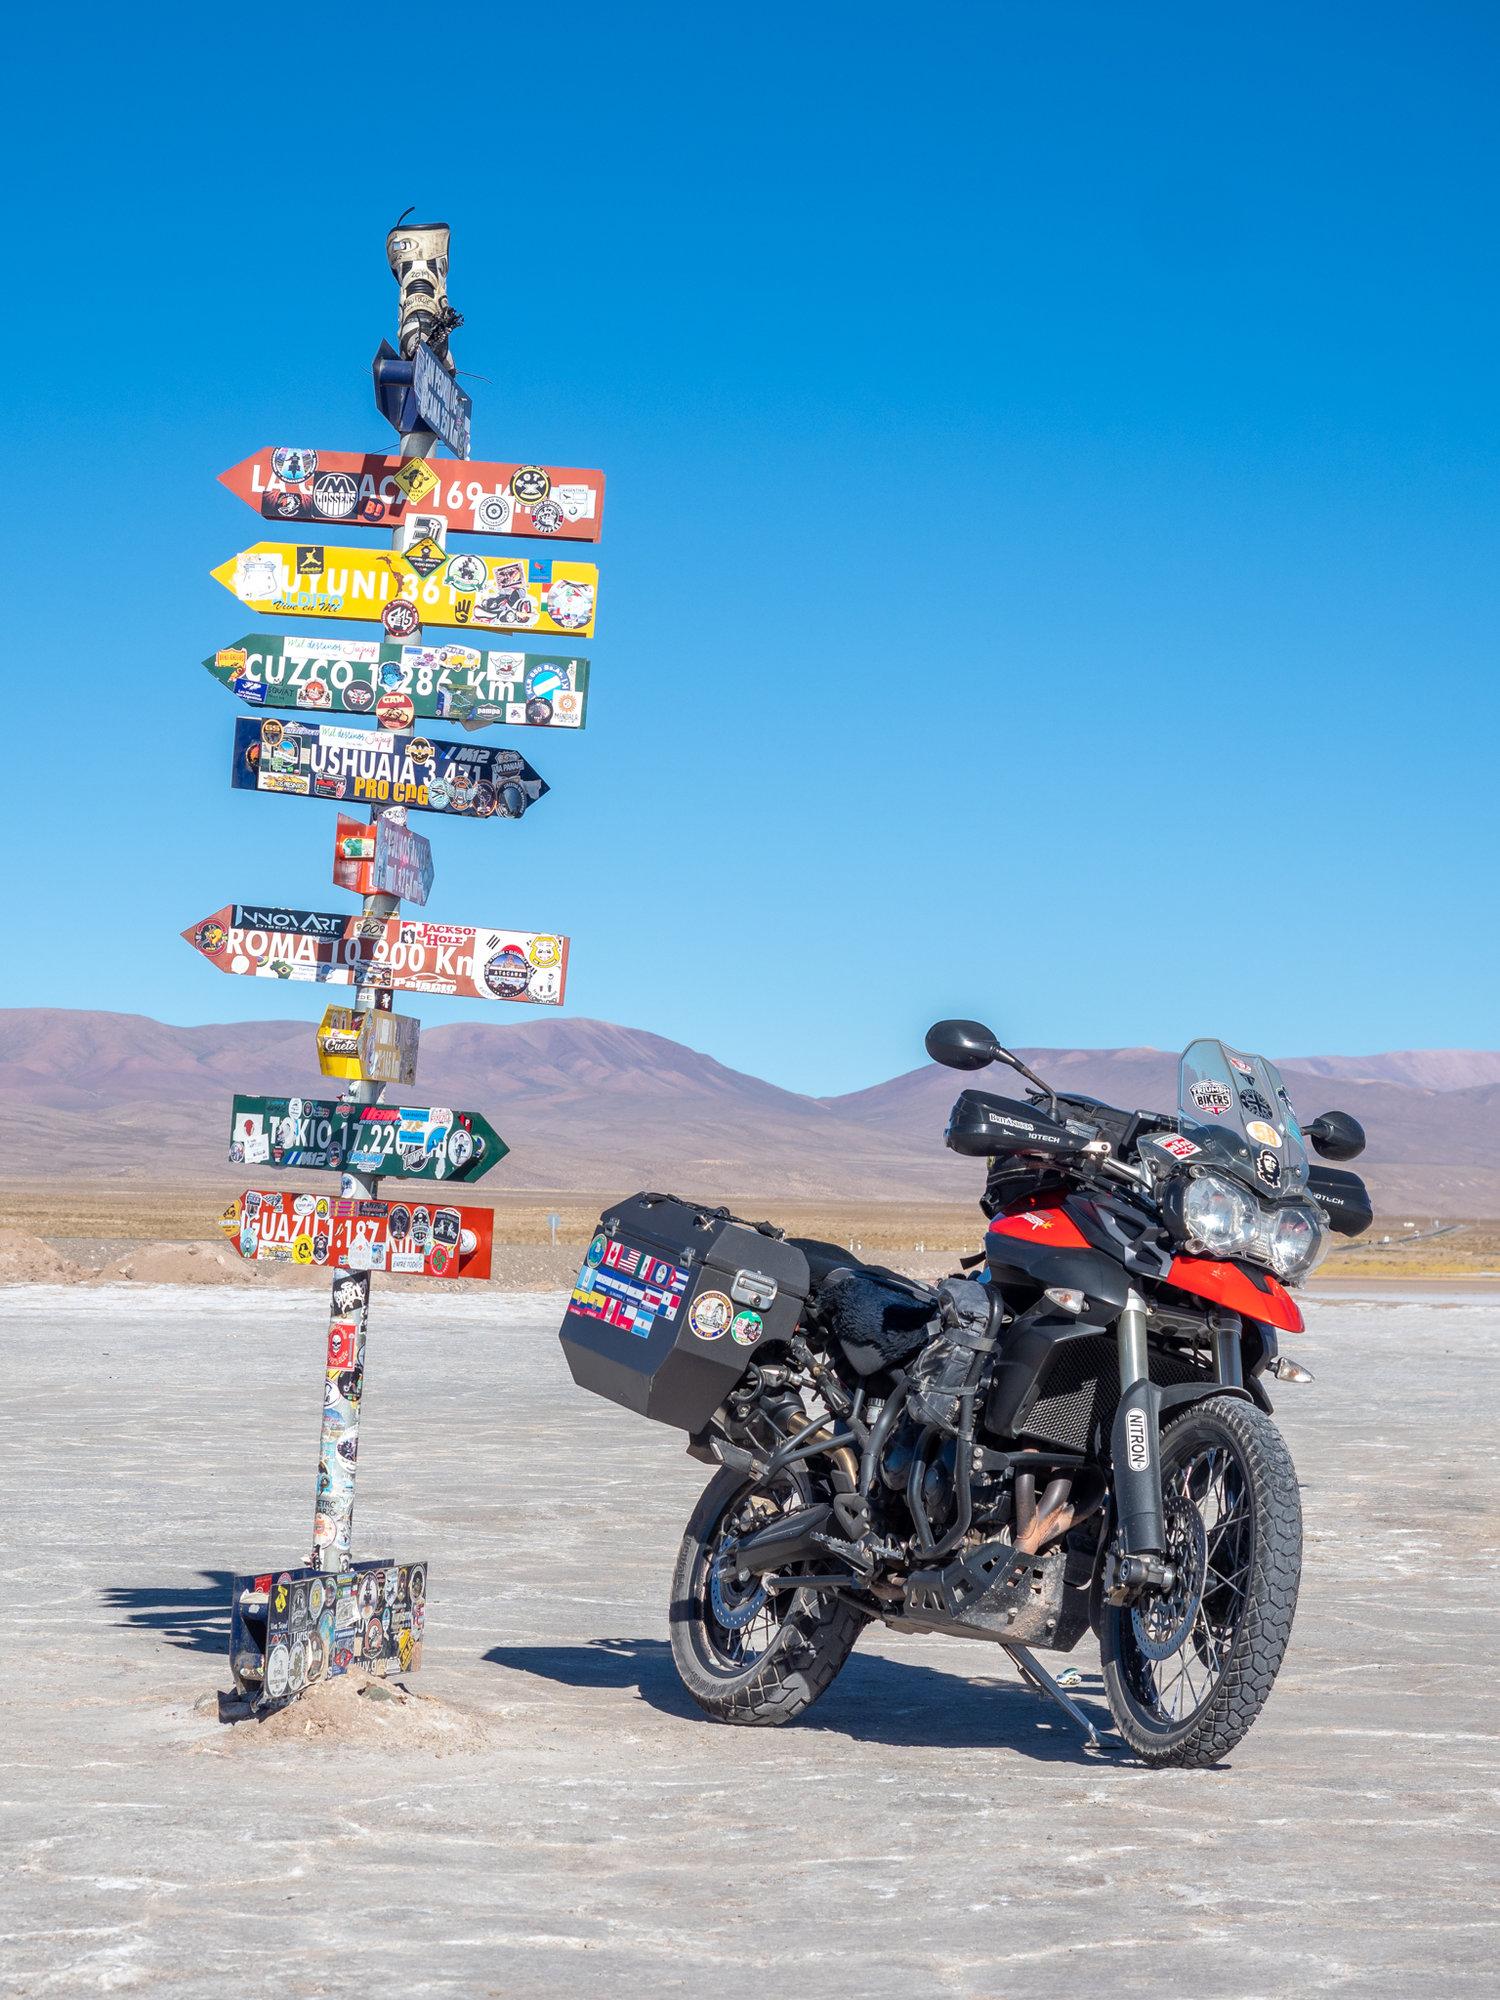 Salar Grande signpost-1.jpg